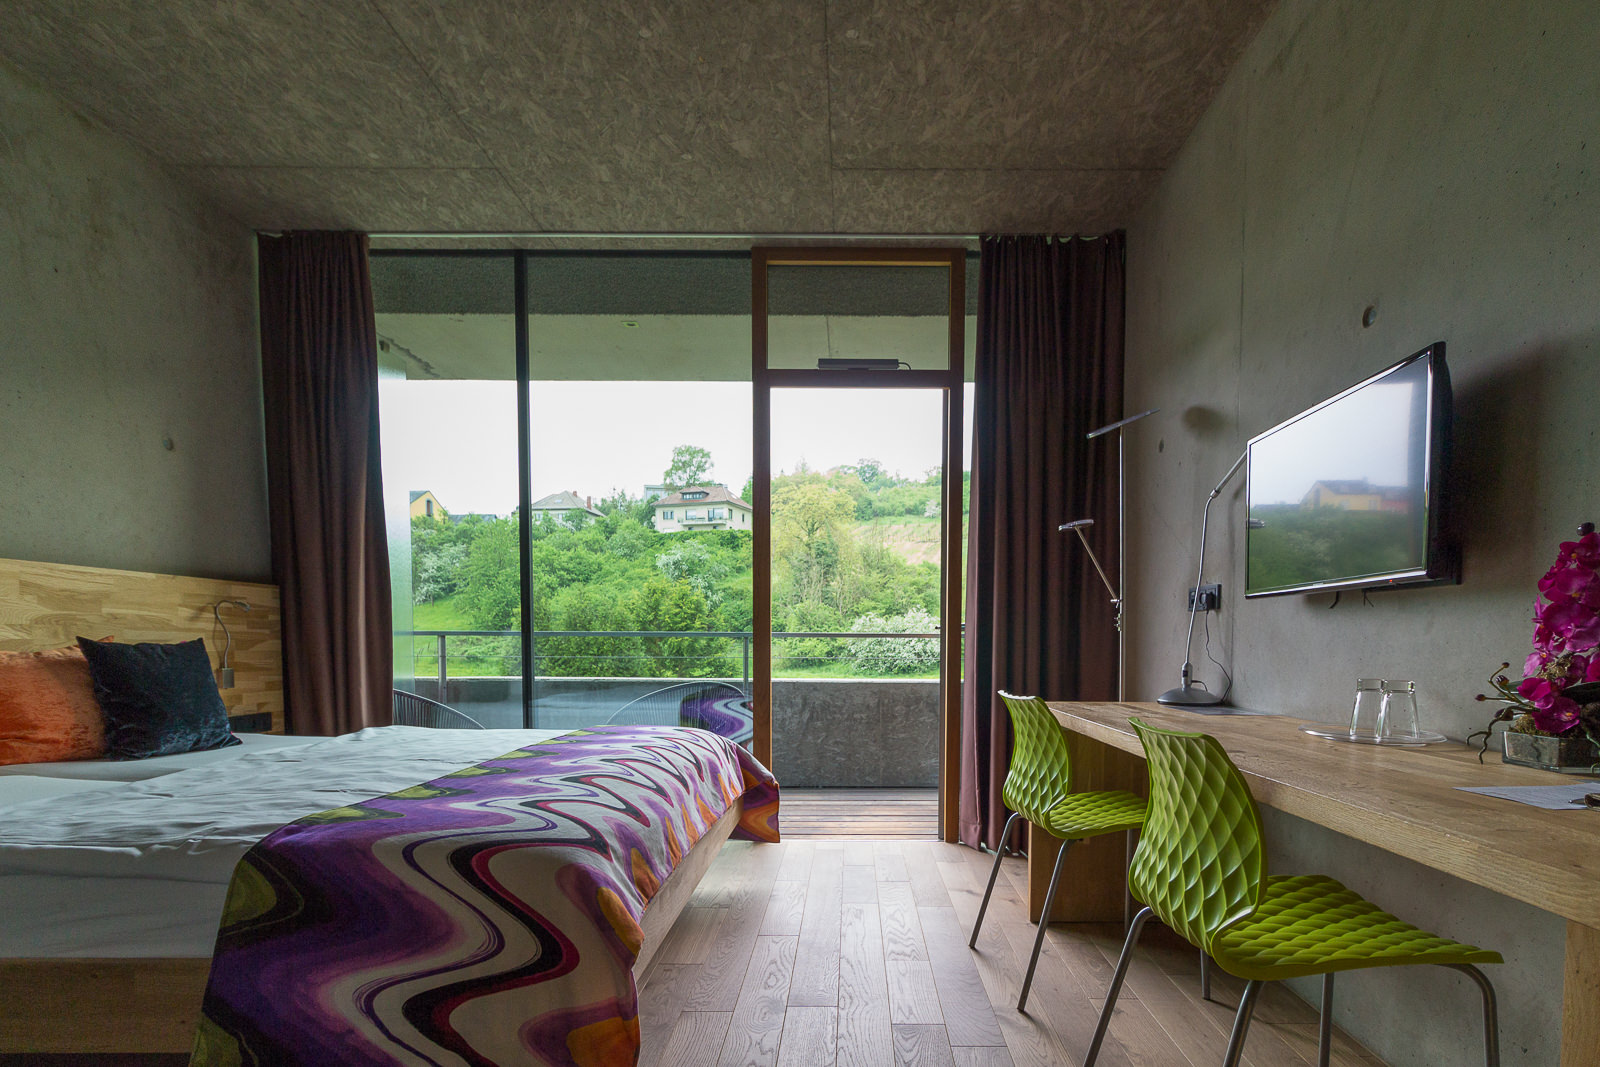 Luxemburgische Mosel, Hotel Ecluse, Luxembourg, übernachten